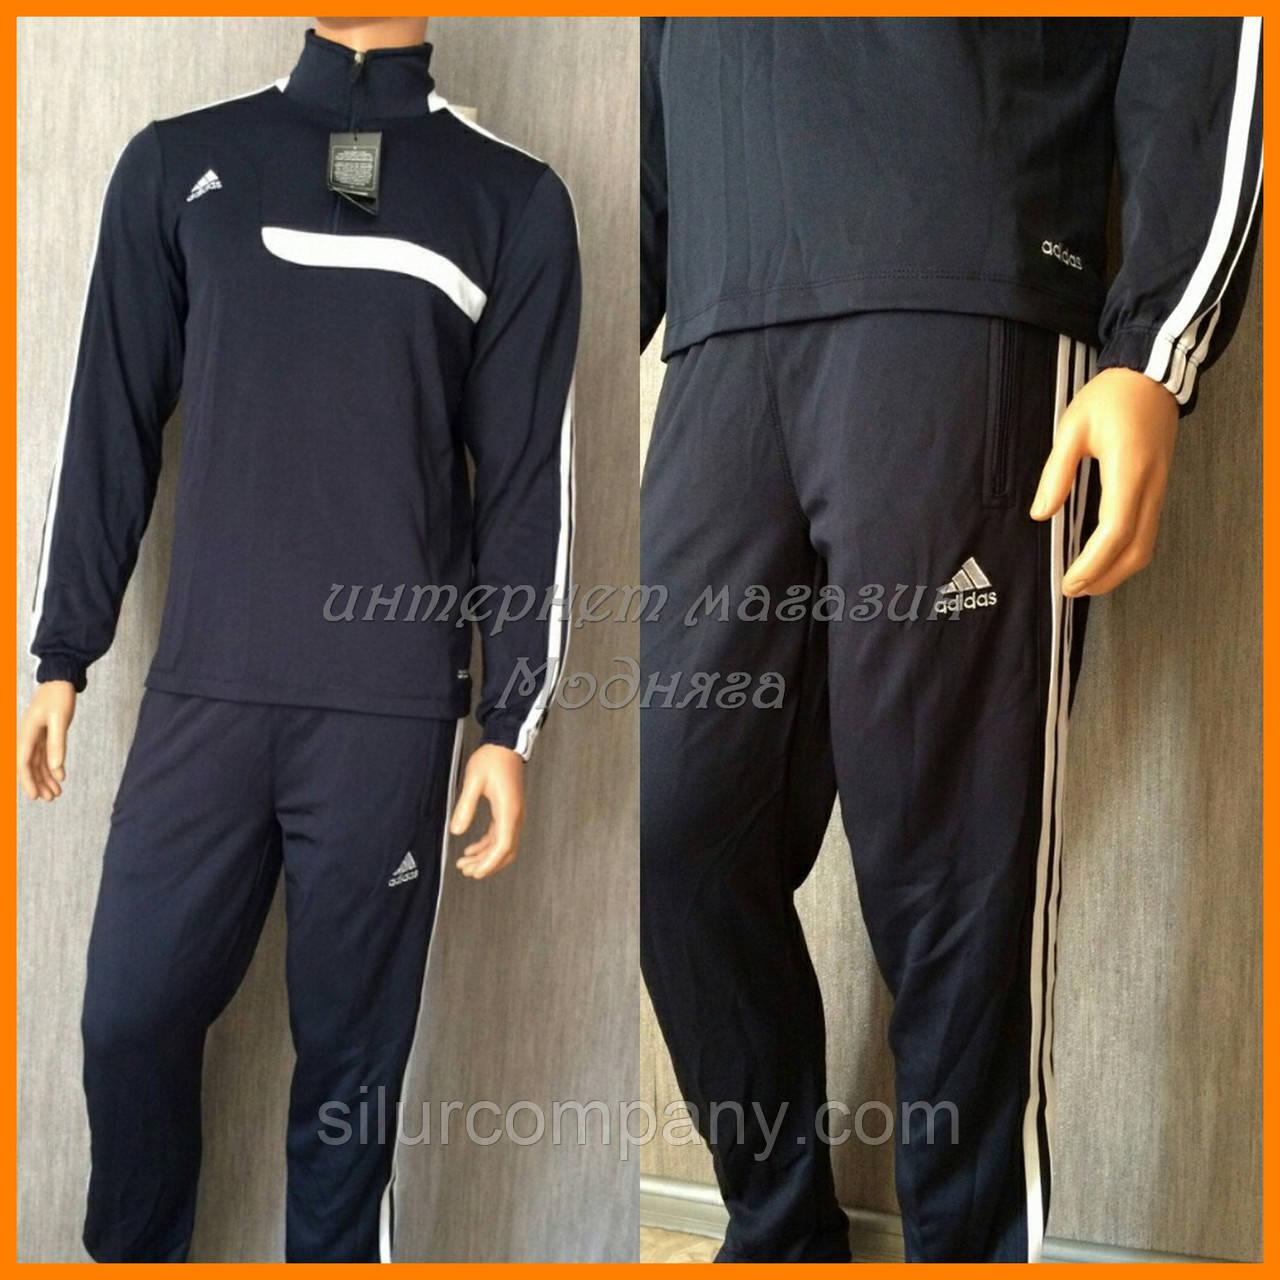 9341f5b0ea32 Магазин мужских спортивных костюмов